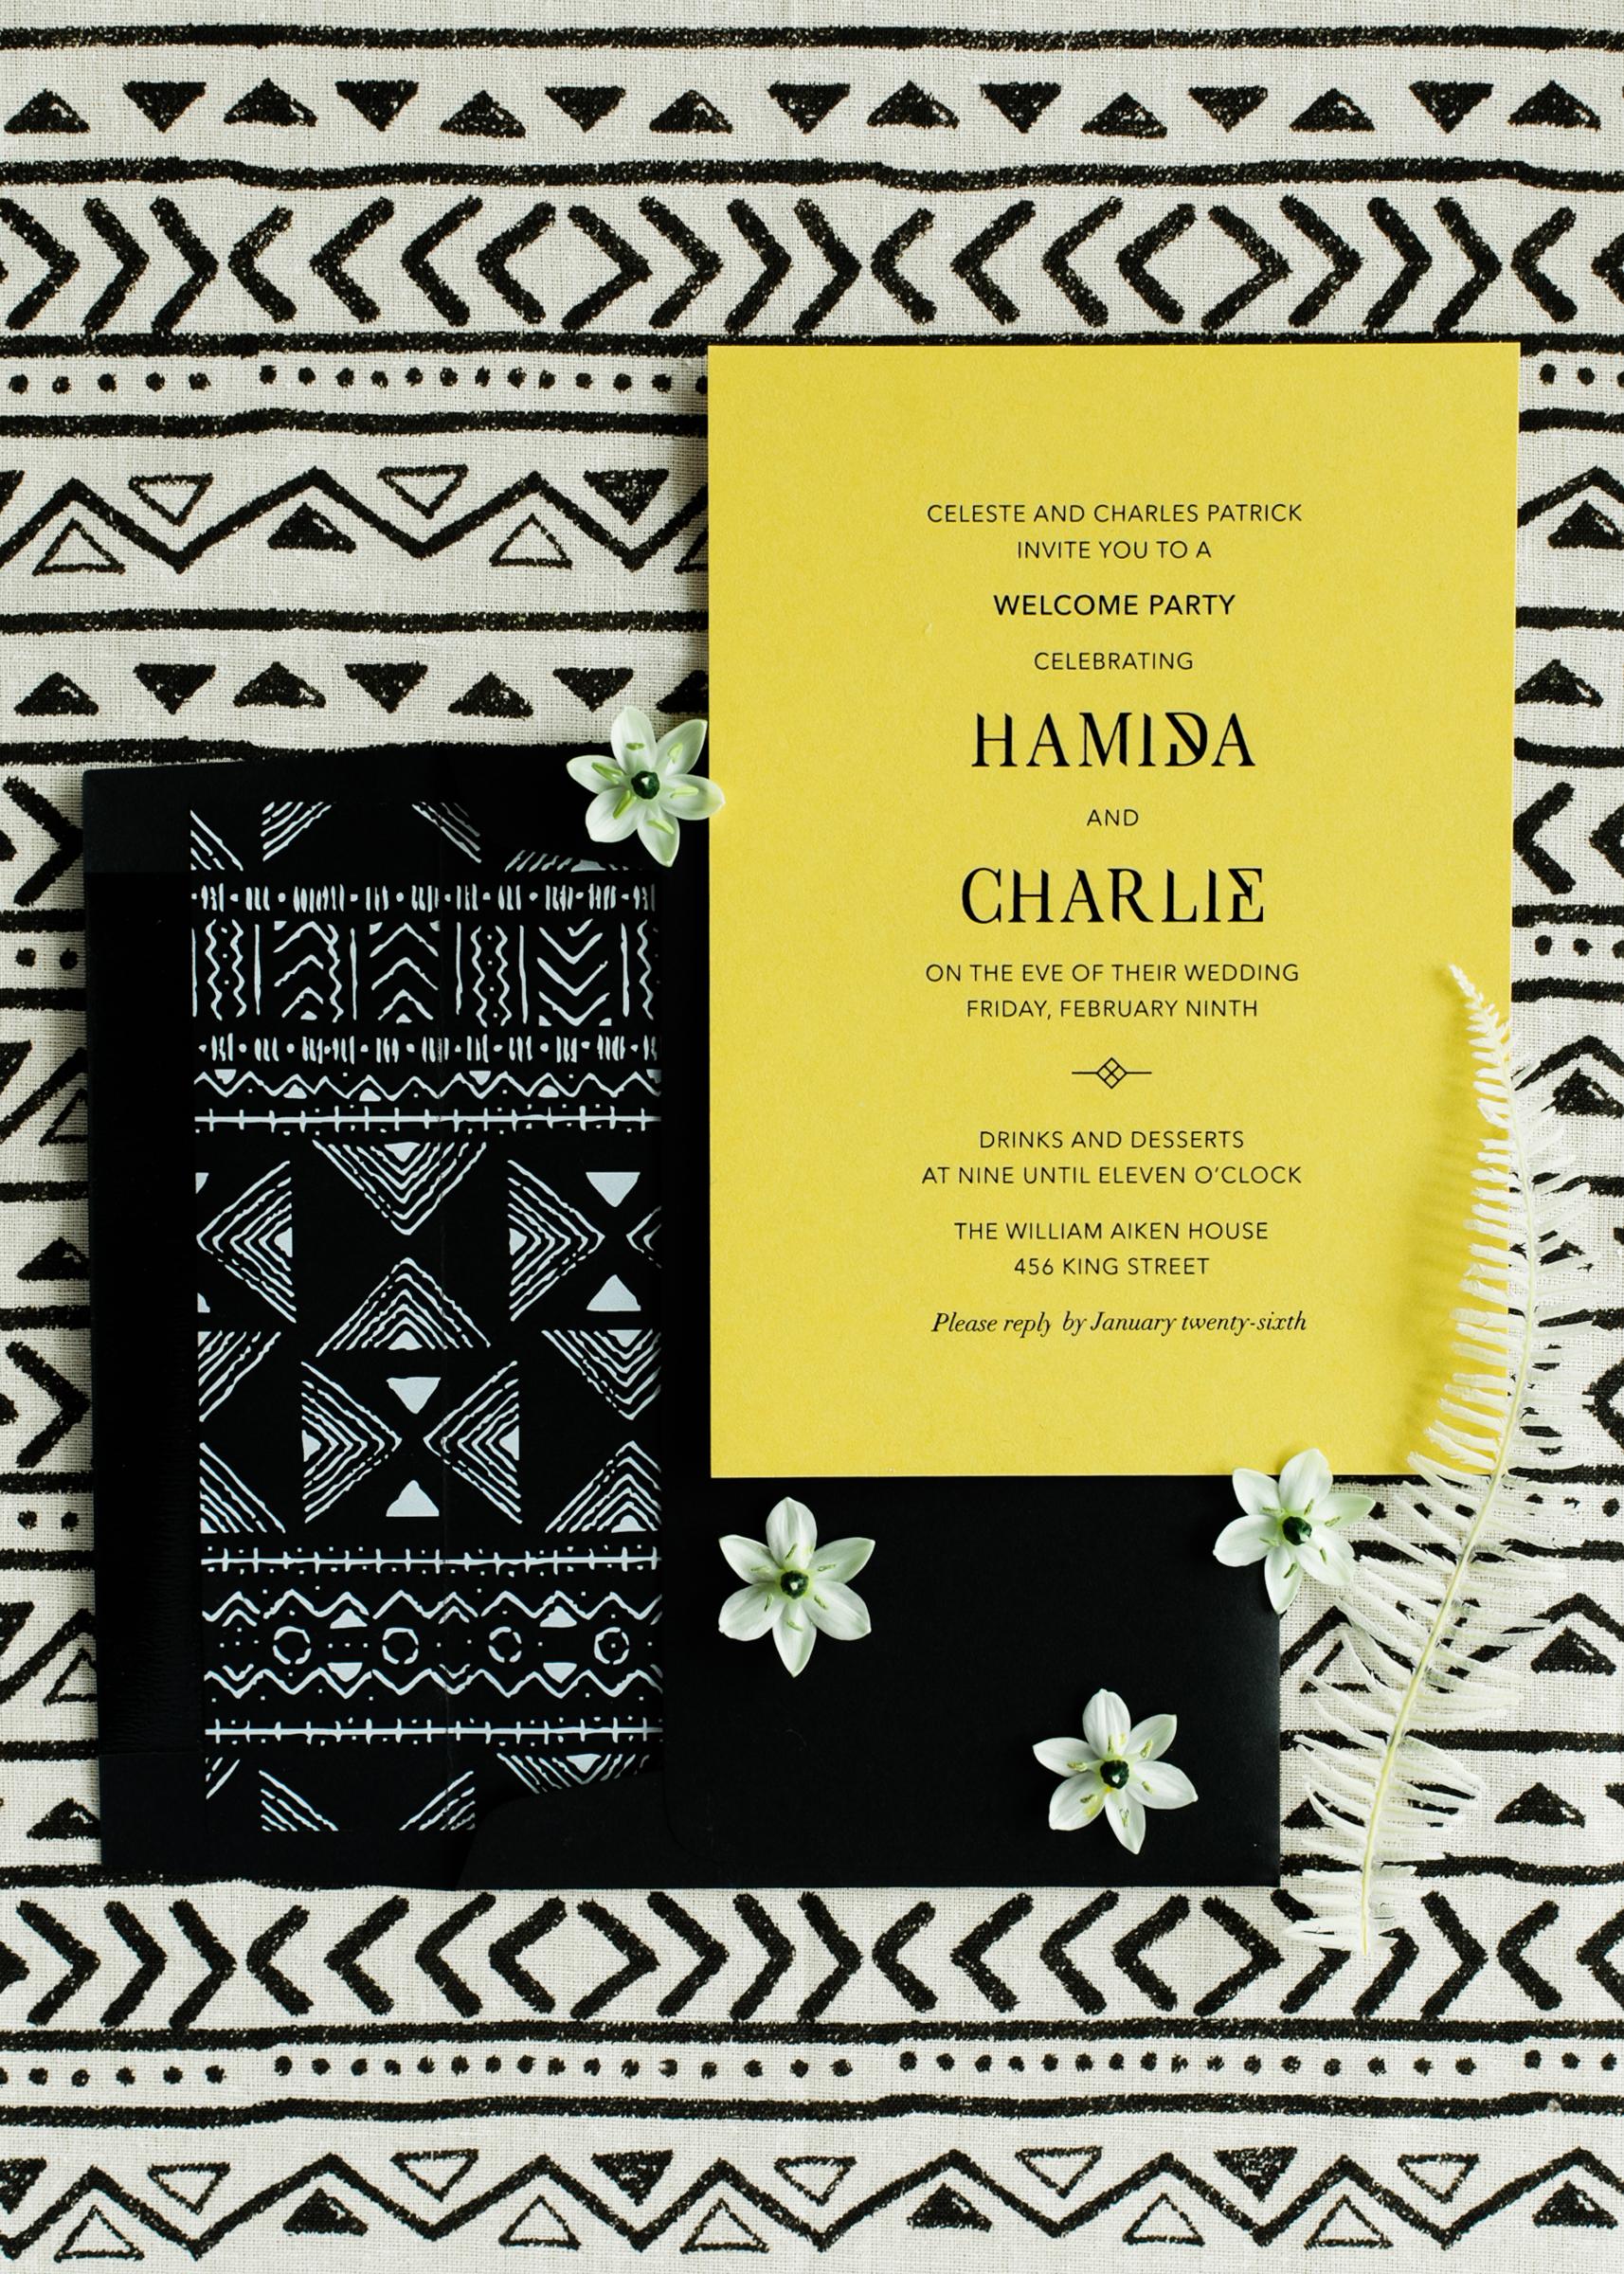 hamida charlie charleson wedding welcome party invitation